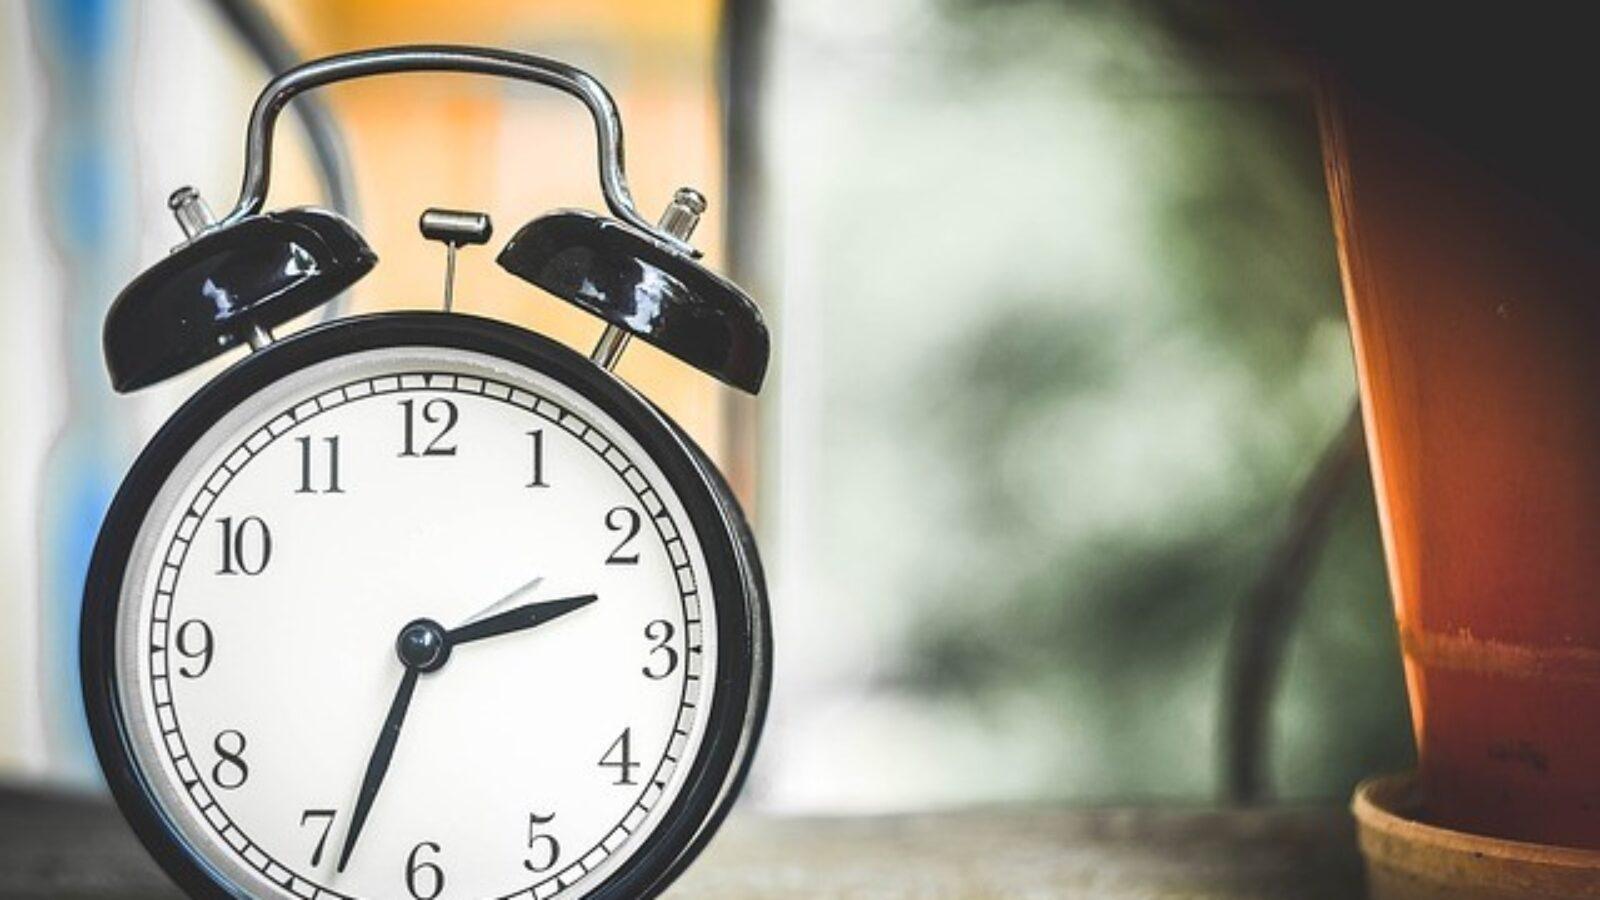 OXMOX Top-Tipp: Uhrenbörse am 03.09. + 16.12 in der Uni-Mensa